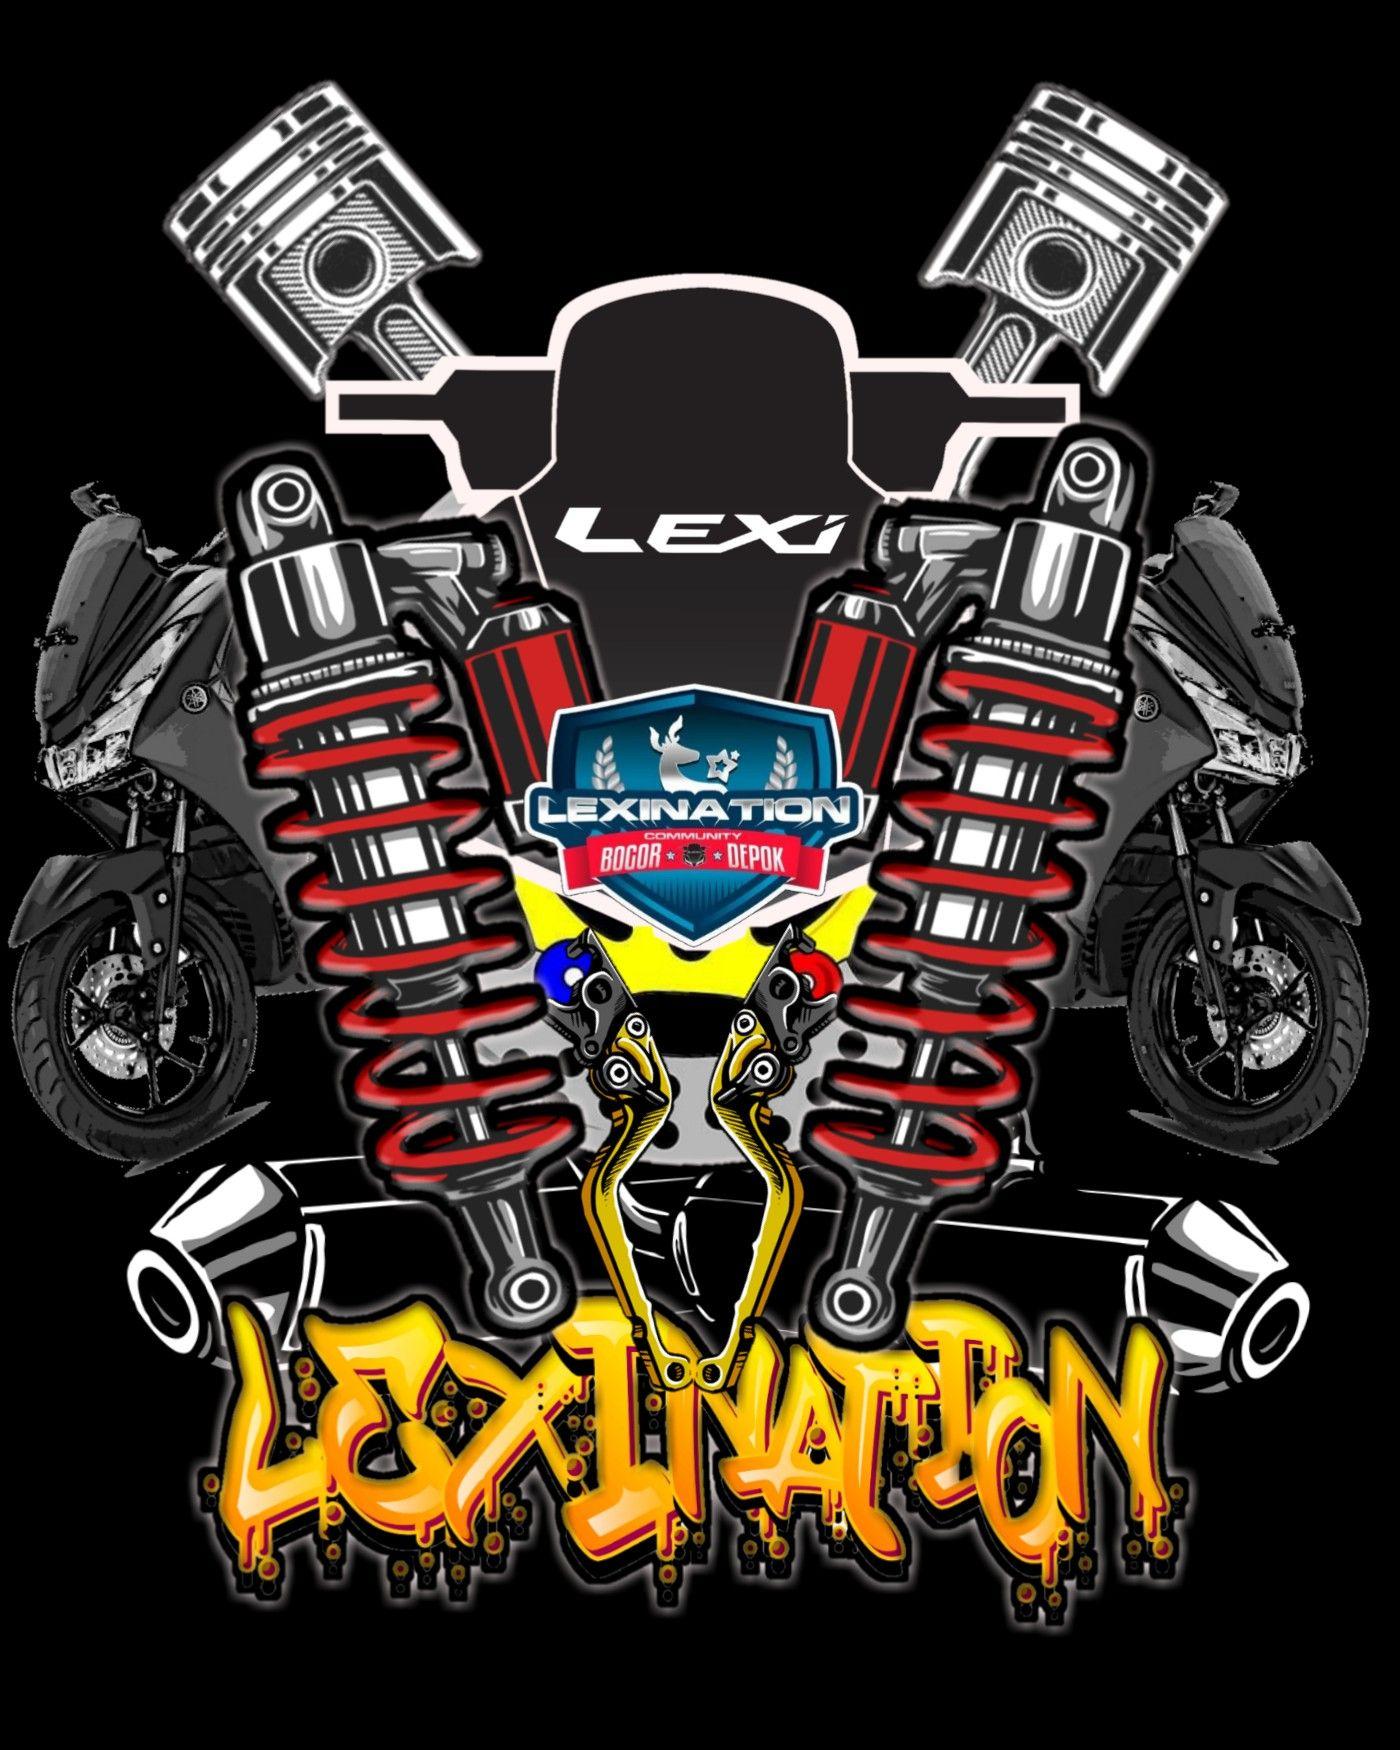 Nmax Logo Png : Lexination, Thailook, Design,, Motorcycles, Vector, Design